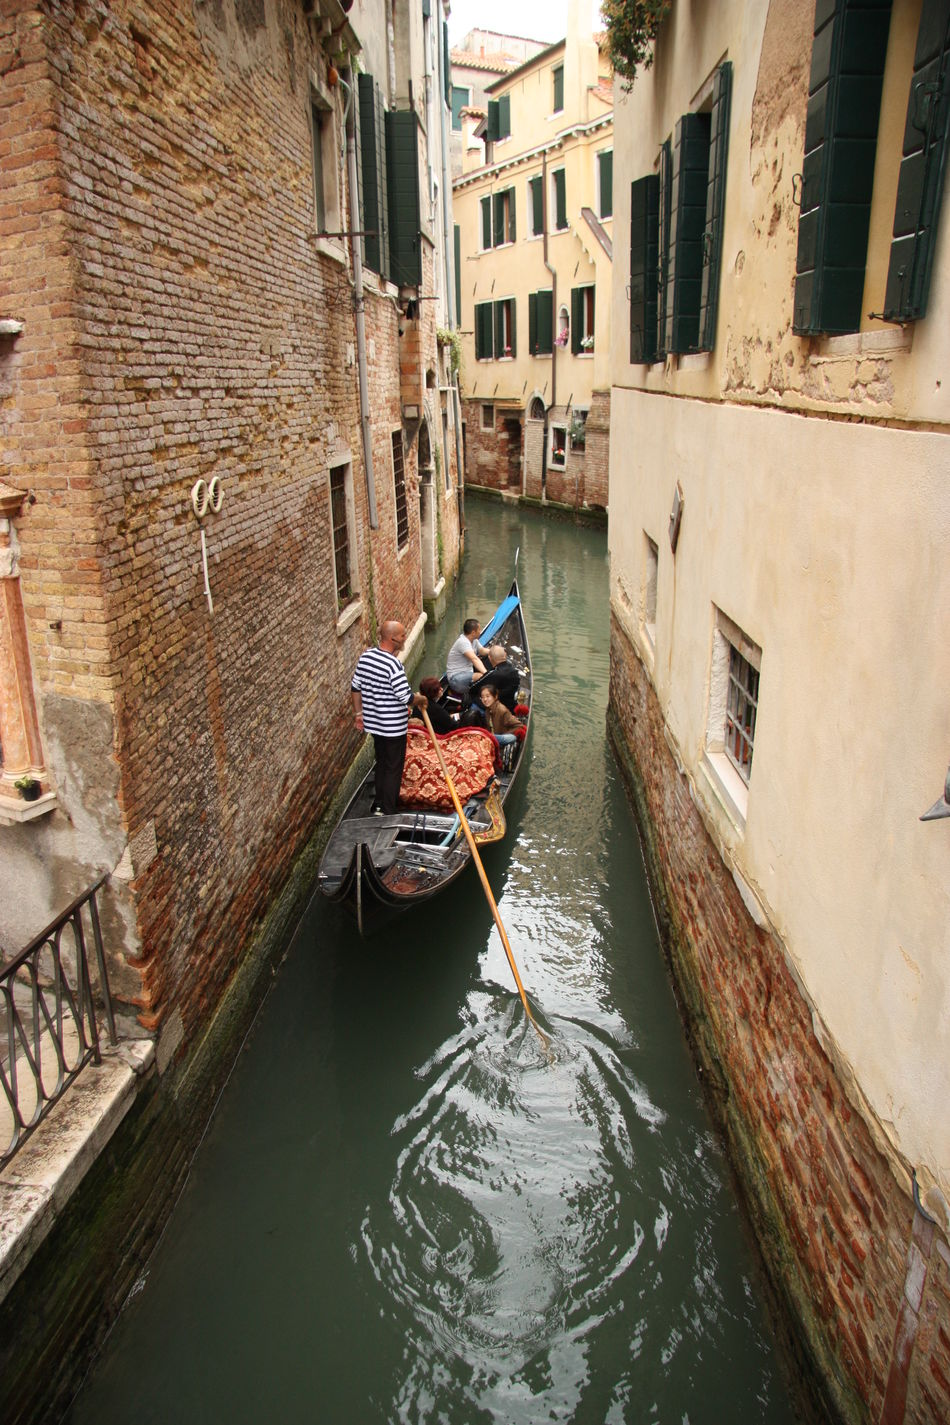 #veneza #Venice #Venezia #Italy #Italia #Europe Architecture Boat Building Exterior Canal Gondola Nautical Vessel Real People Transportation Water